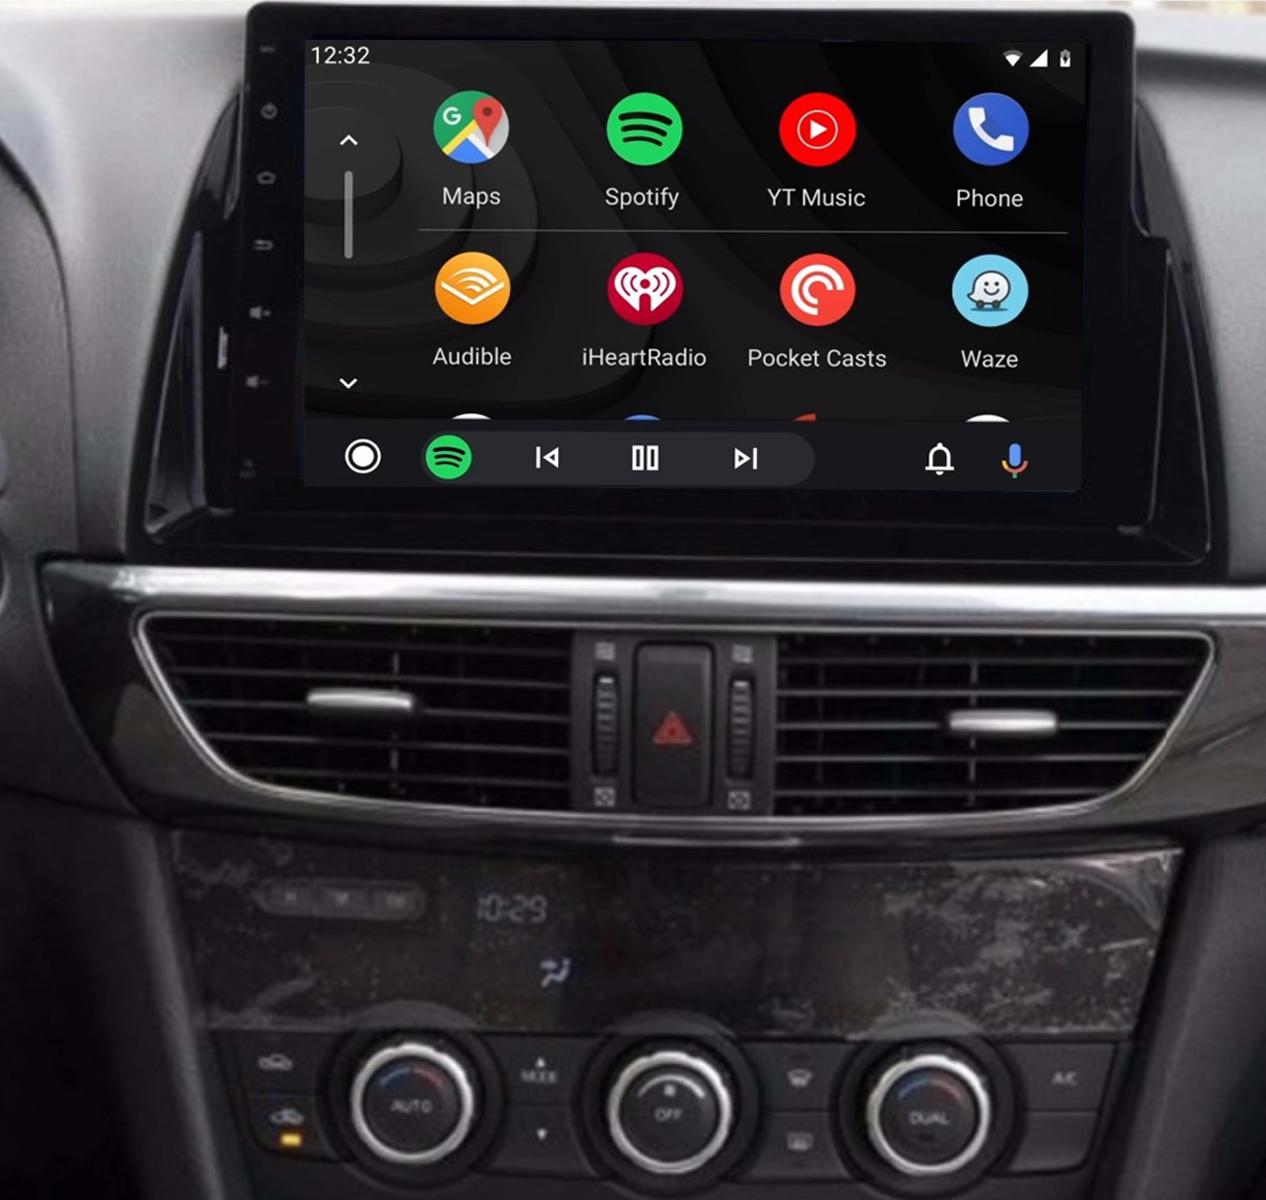 Ecran tactile QLED Android 11.0 + Apple Carplay sans fil Mazda CX-5 et Mazda 6